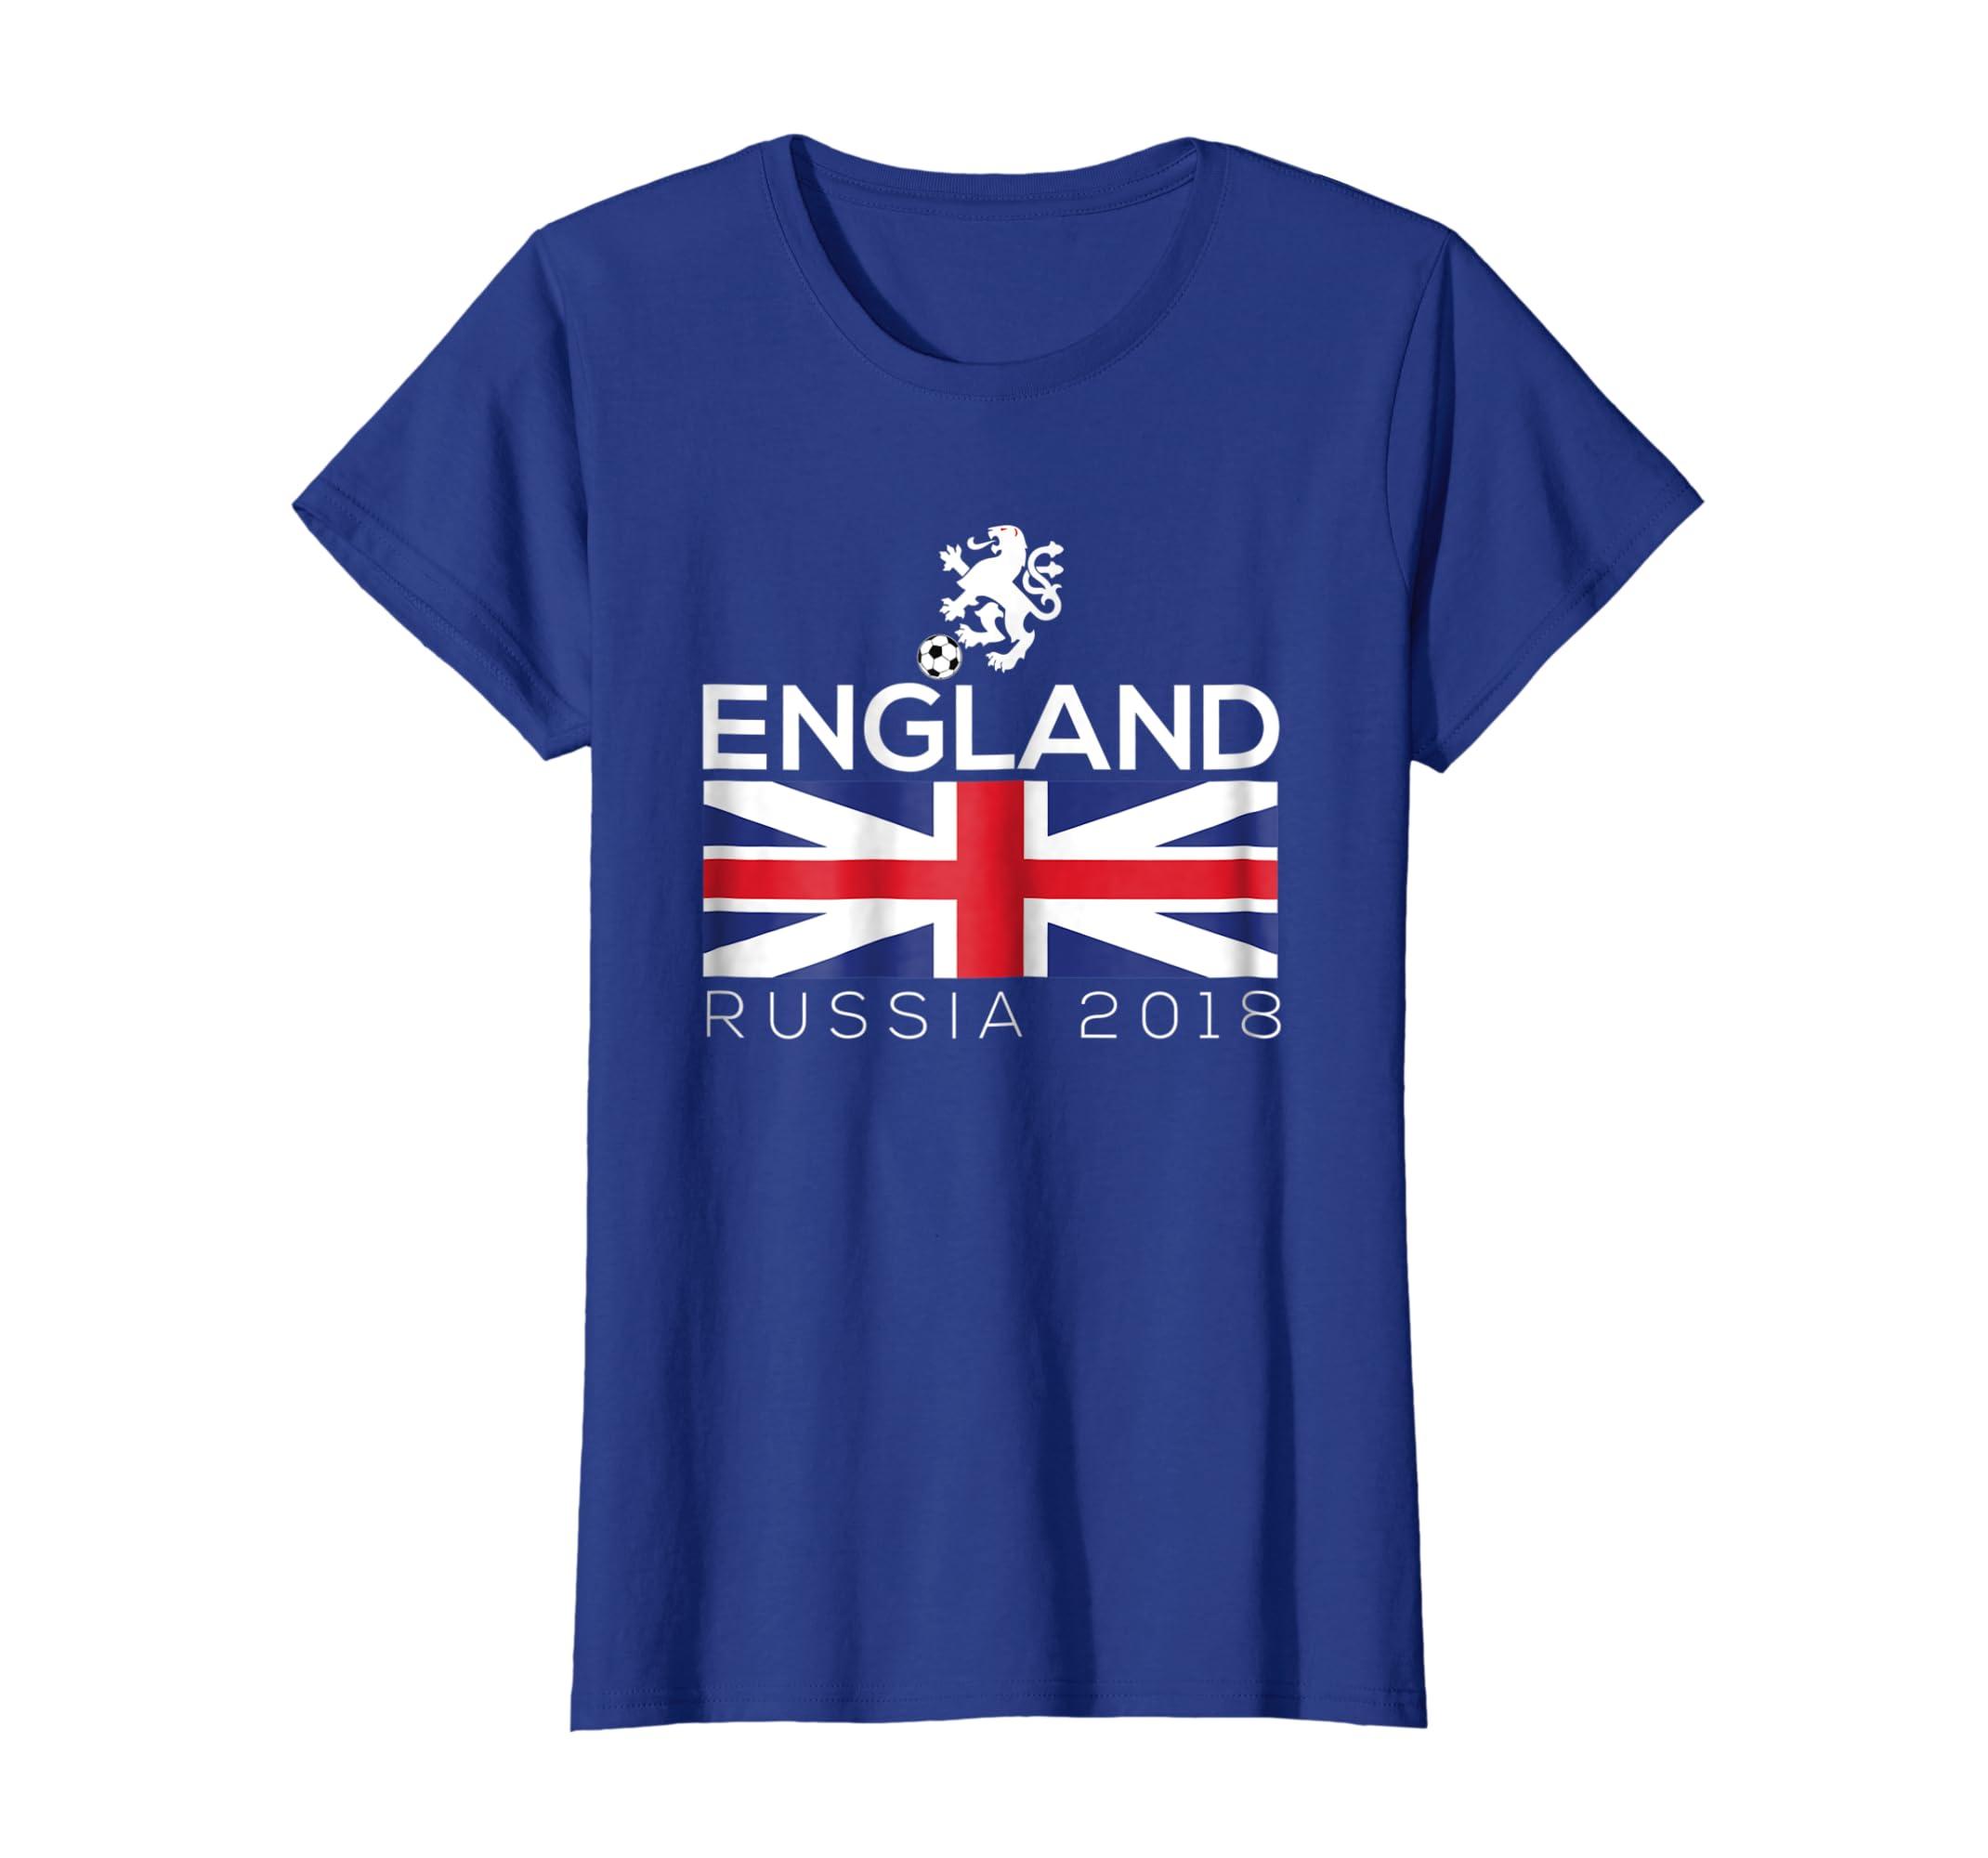 083a5cead Amazon.com: 2018 England British Soccer Fan Shirt Football Jersey Shirt:  Clothing